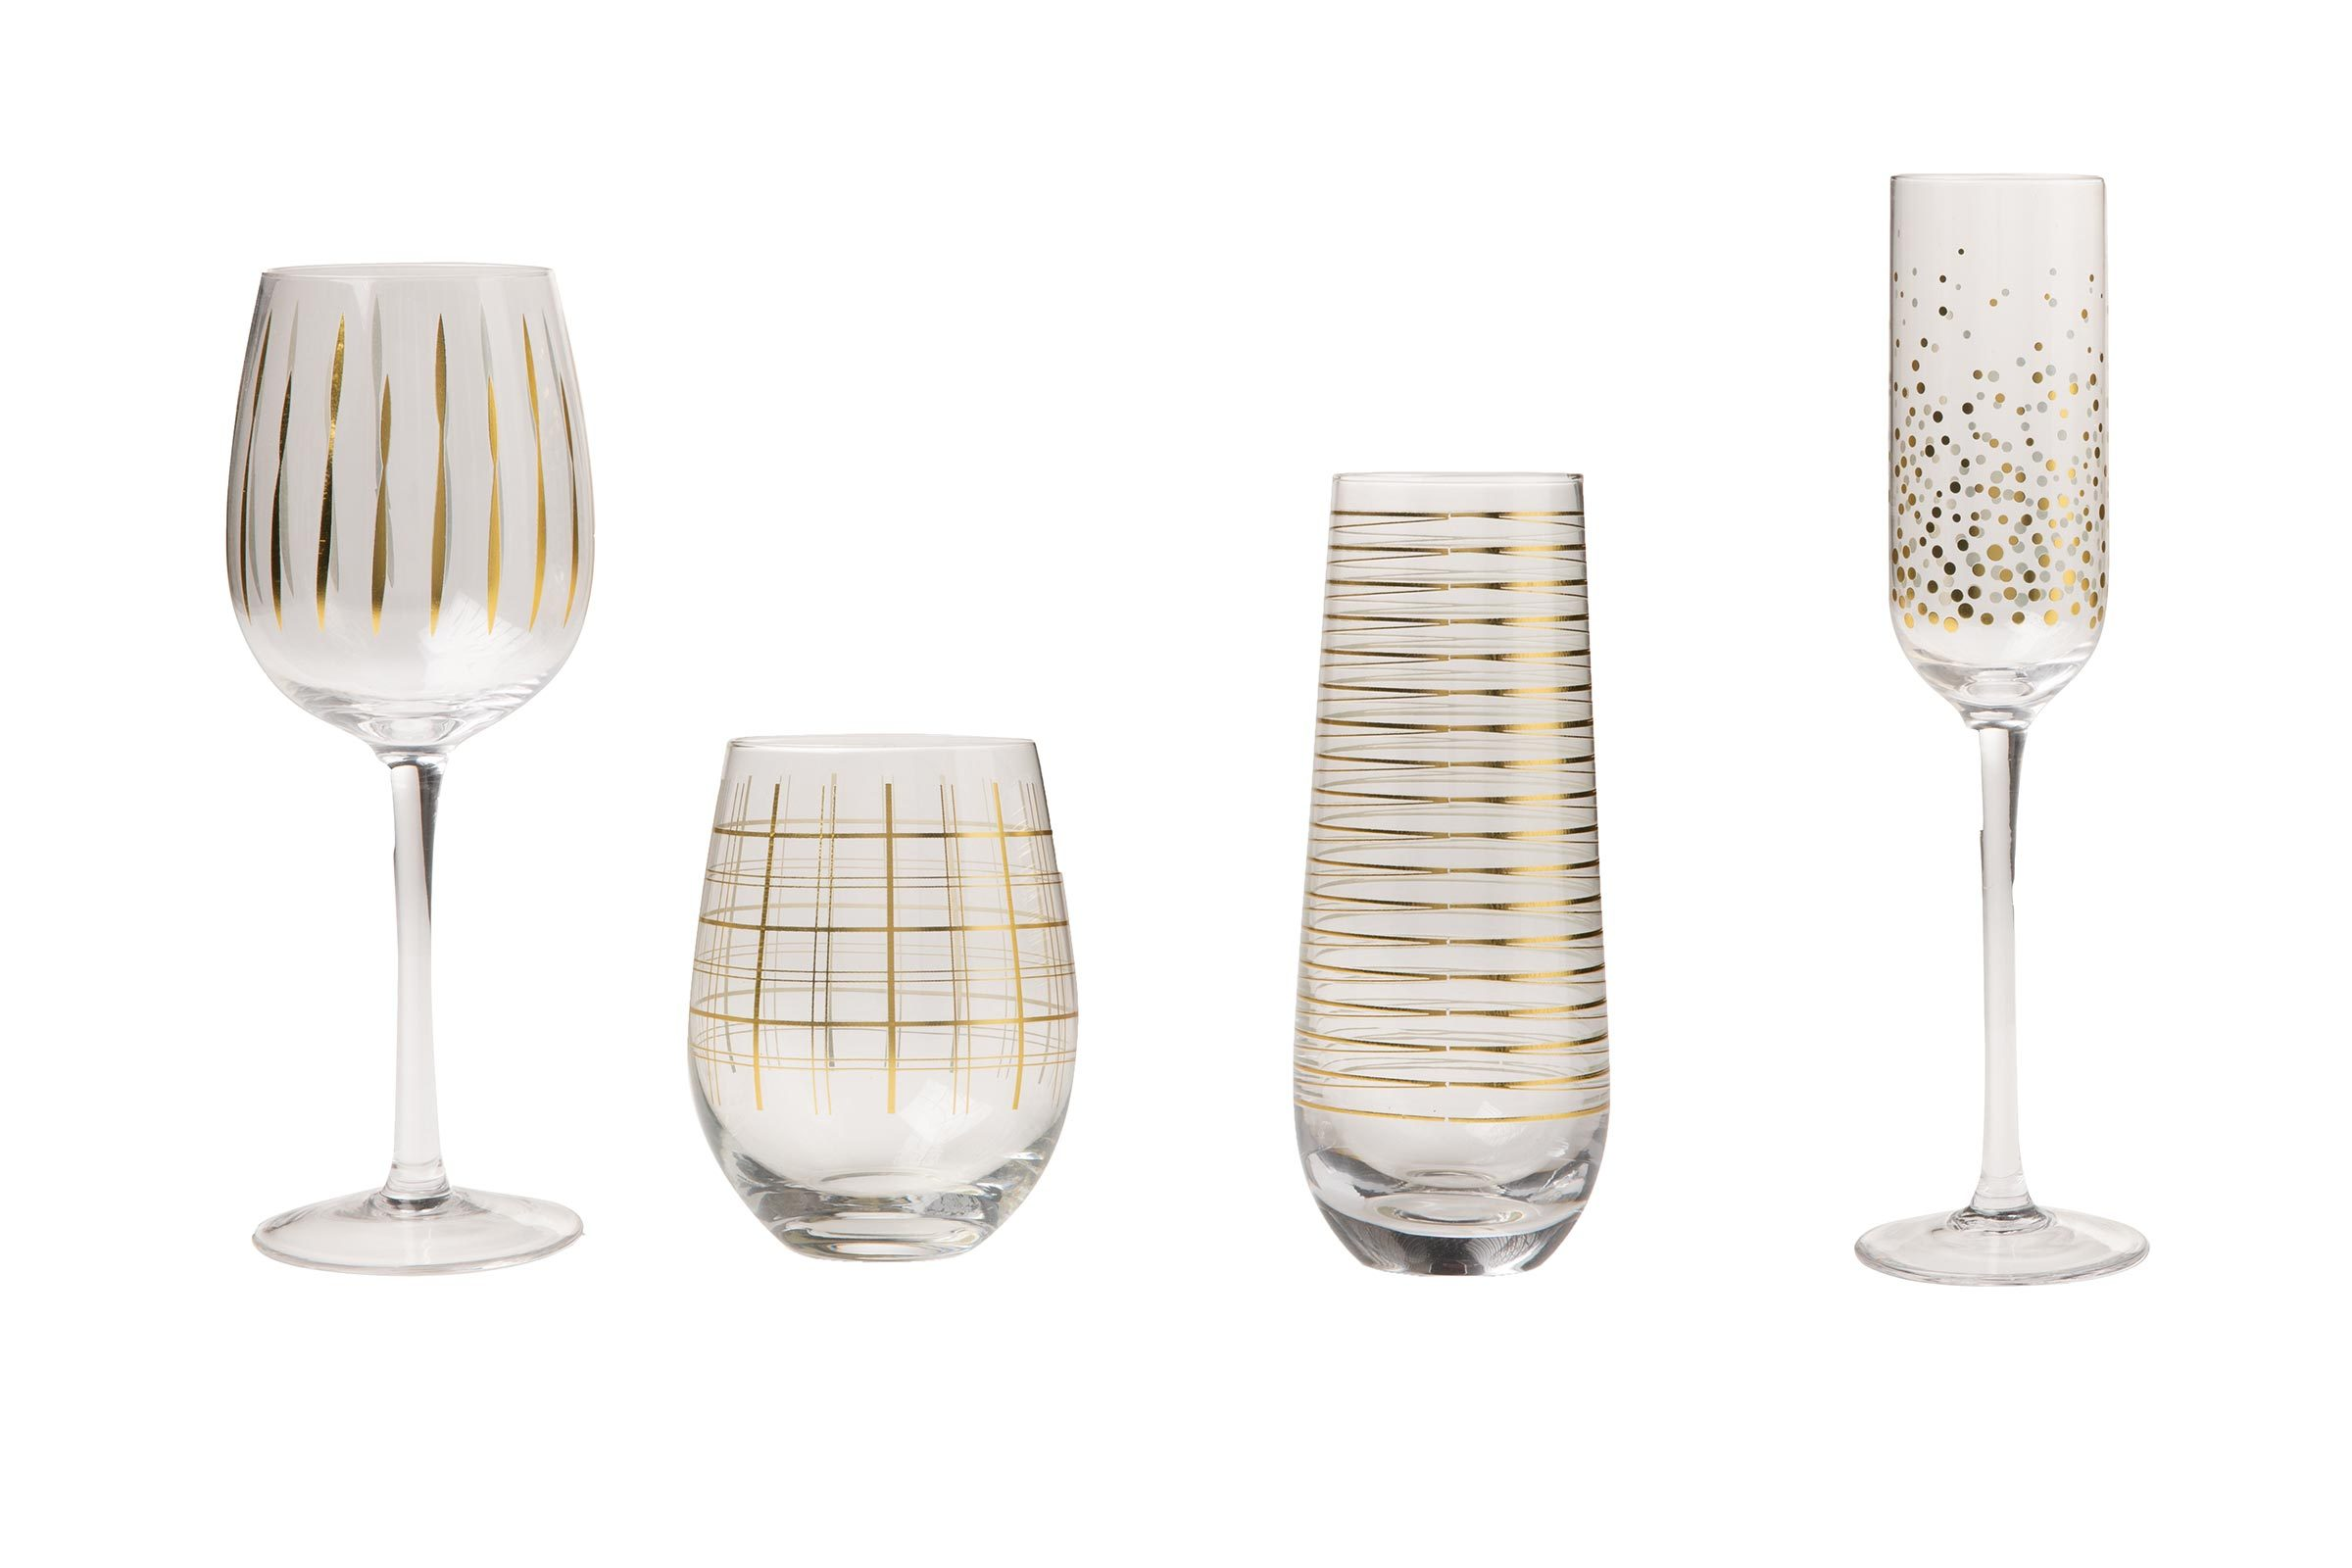 Crofton 4pk wine or champagne glasses